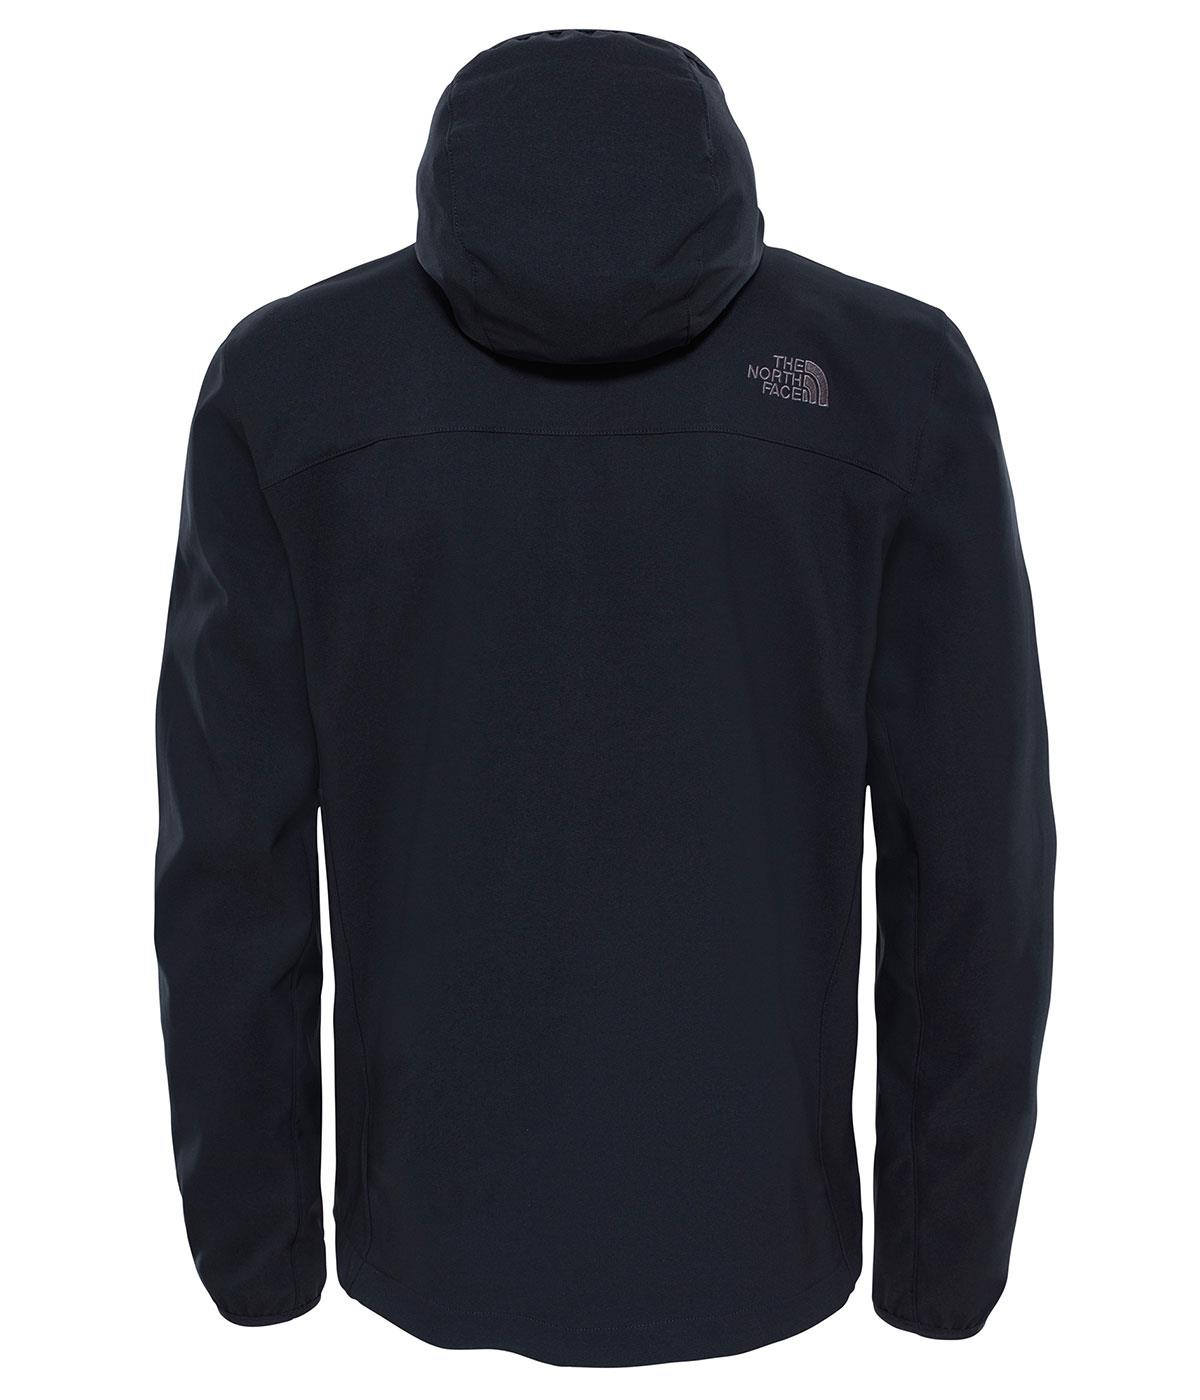 The Northface Erkek Nimble Hoodie Swetshirt T92Xlbjk3